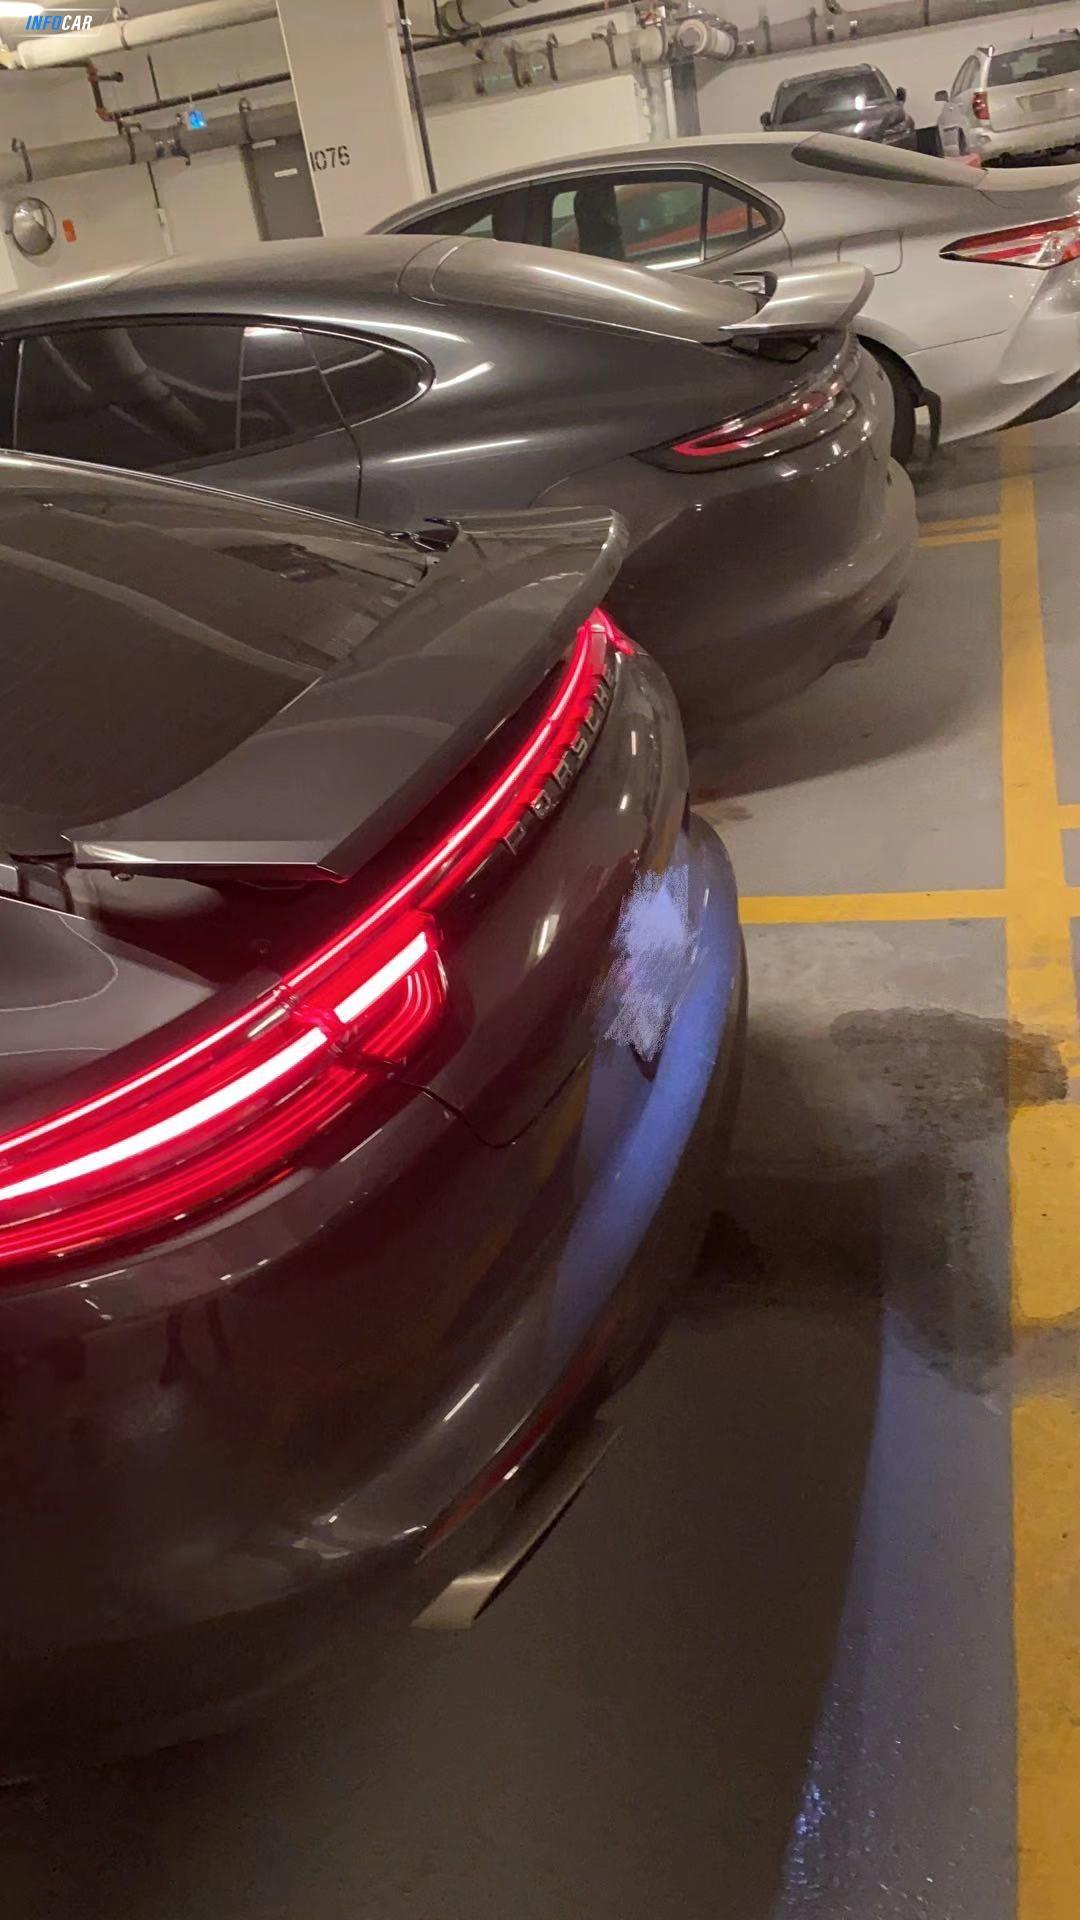 2018 Porsche Panamera 4 - INFOCAR - Toronto's Most Comprehensive New and Used Auto Trading Platform